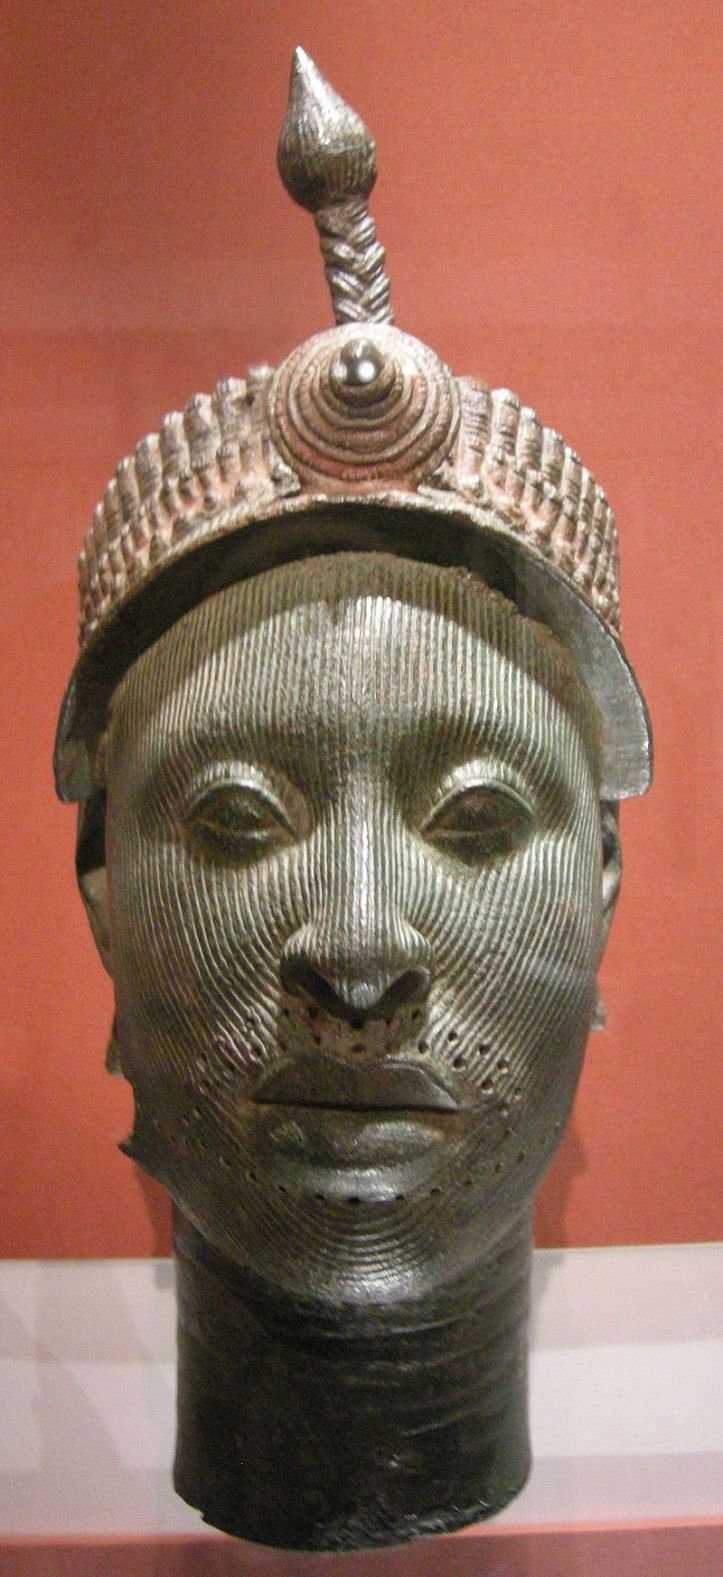 800px-arte_yoruba_nigeria_testa_da_ife_12-15mo_secolo